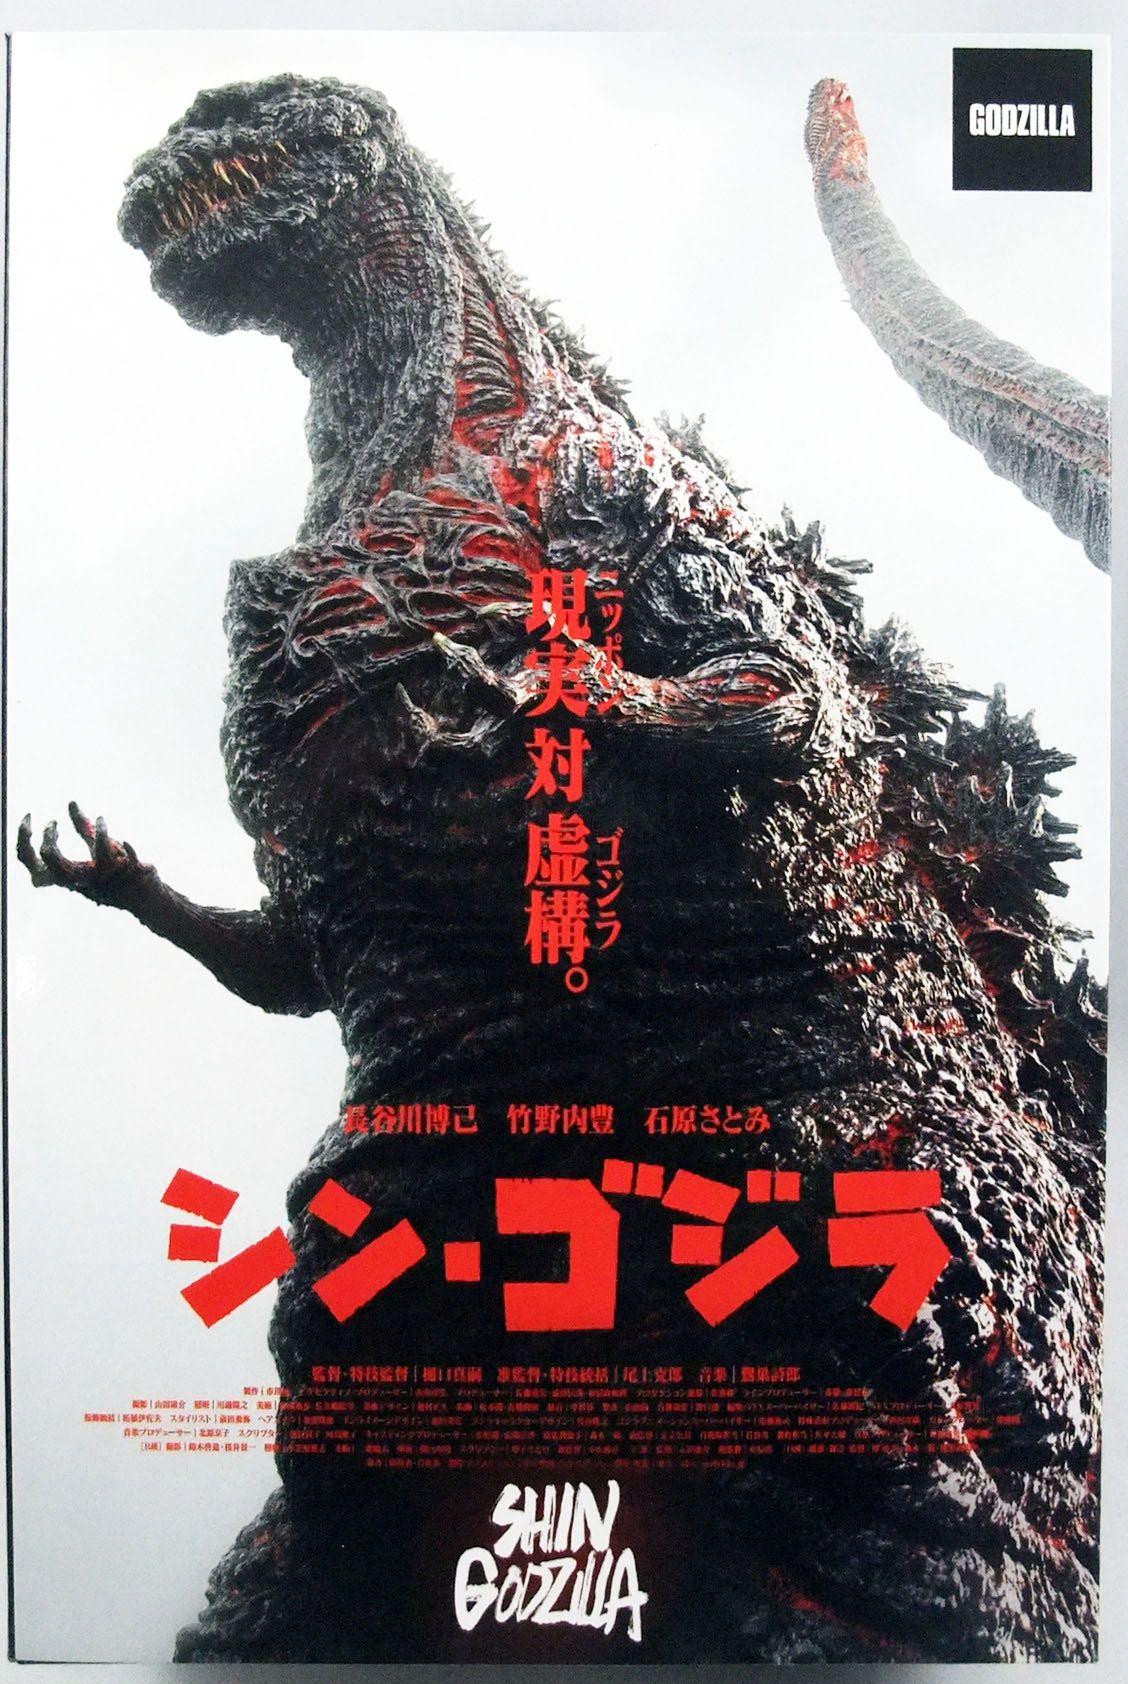 esplosione atomica 2016 NECA GODZILLA Shin GODZILLA